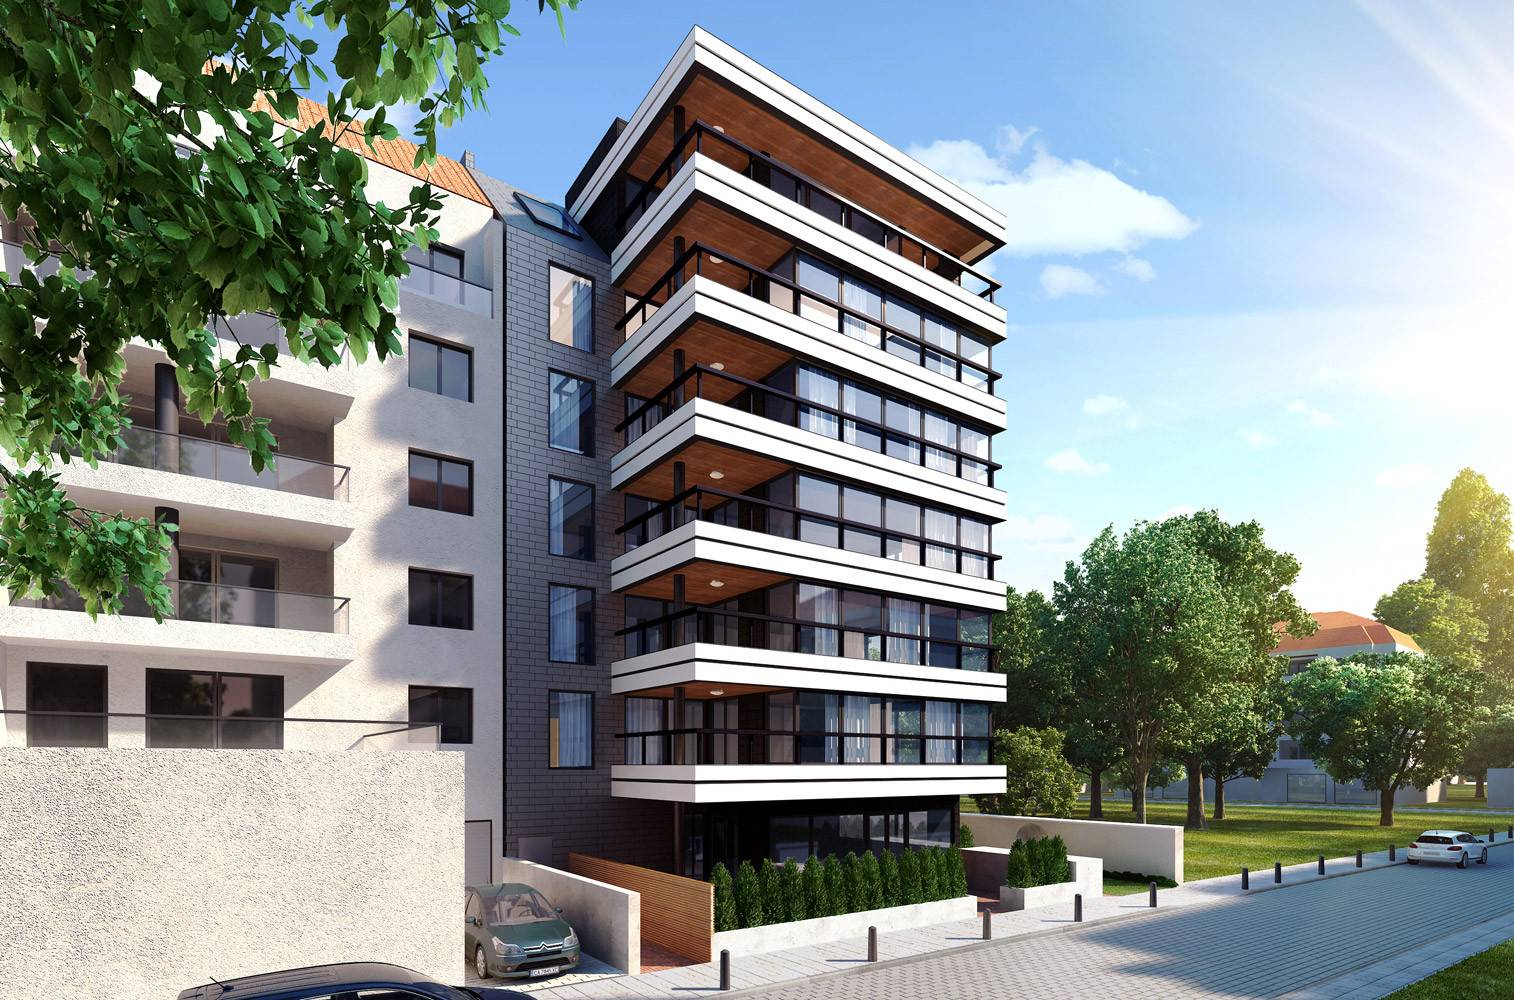 ^ esidential Building Lozenets Sofia - Home Building Plans #31715